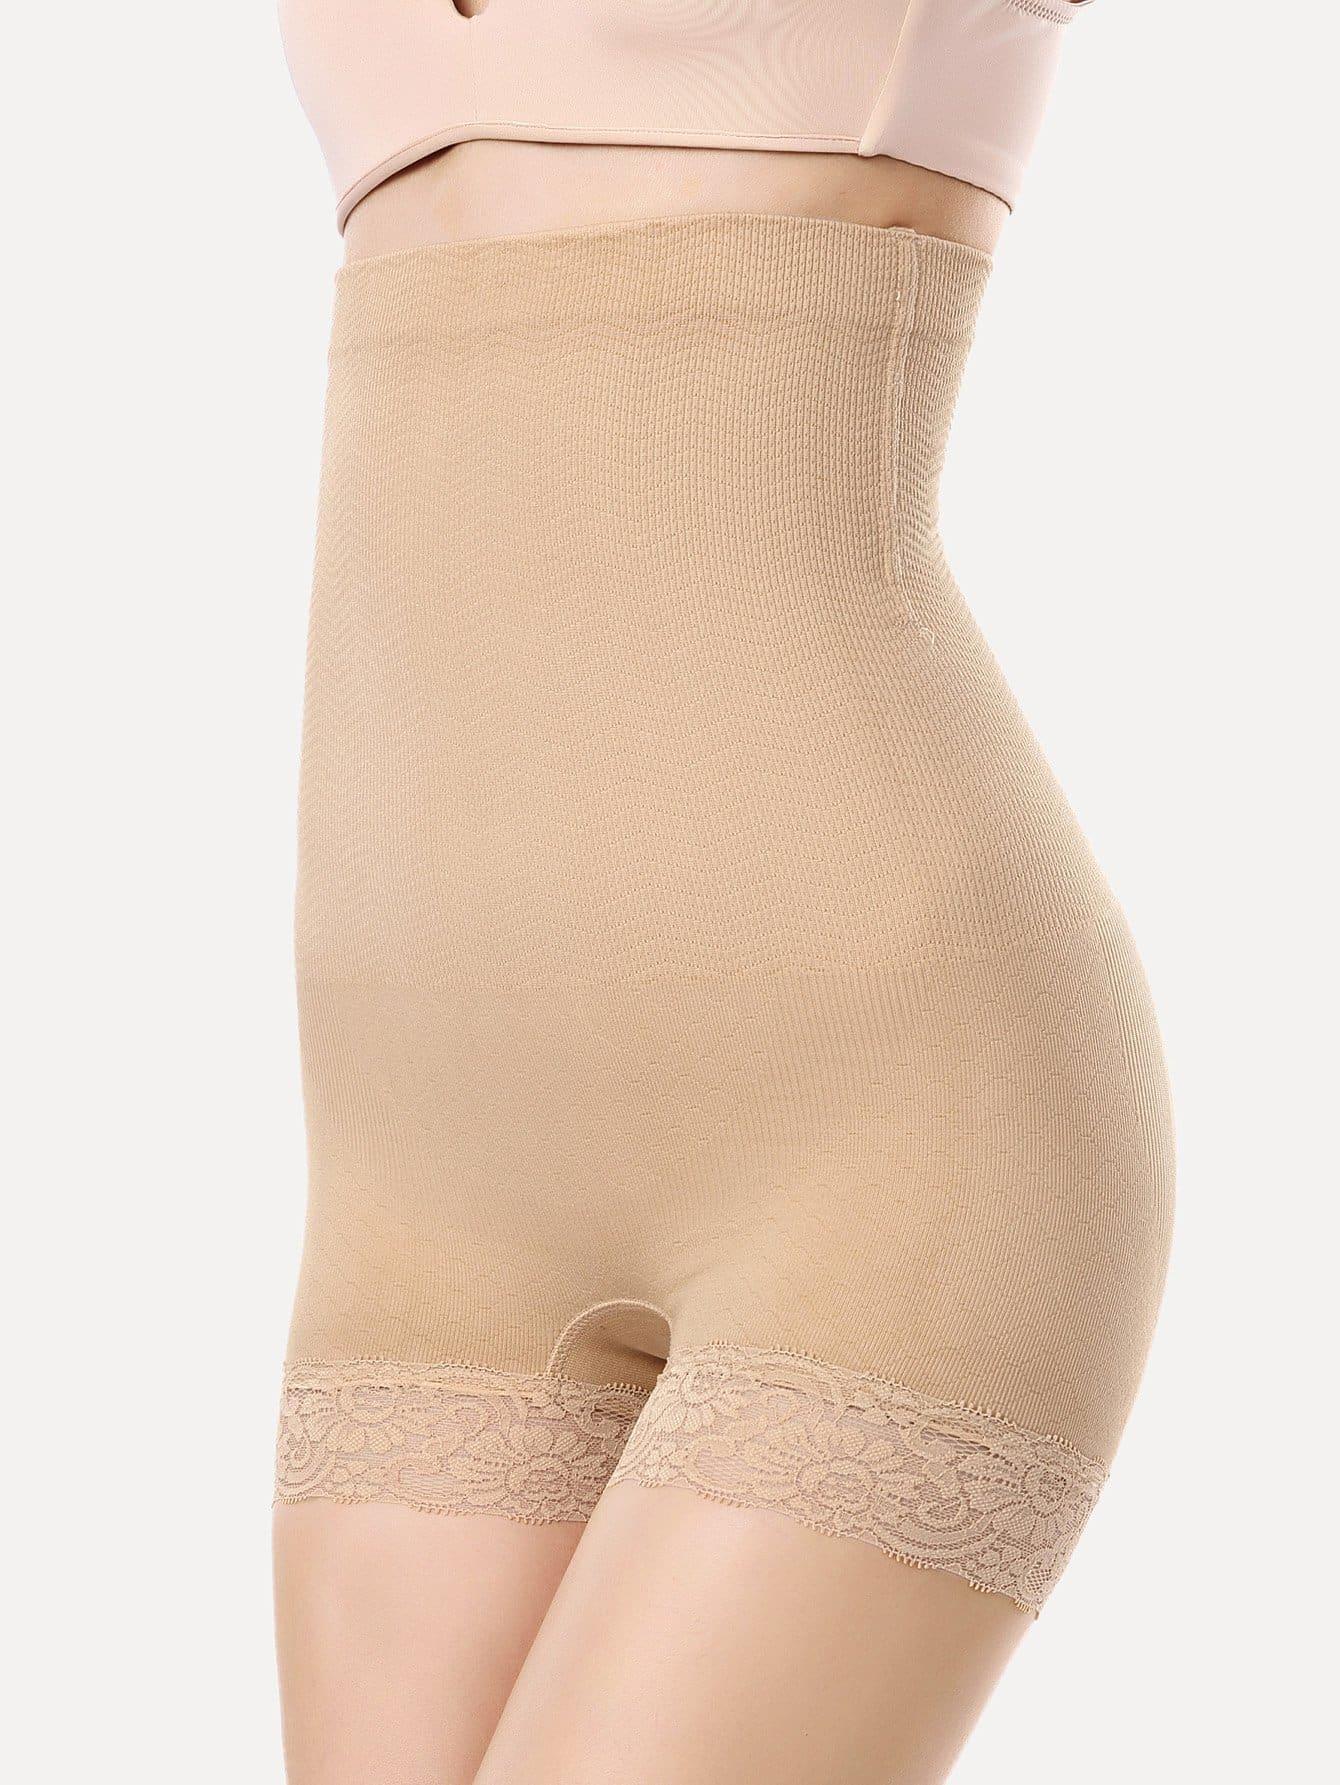 Contrast Lace High Waist Shapewear Shorts black high waist shorts